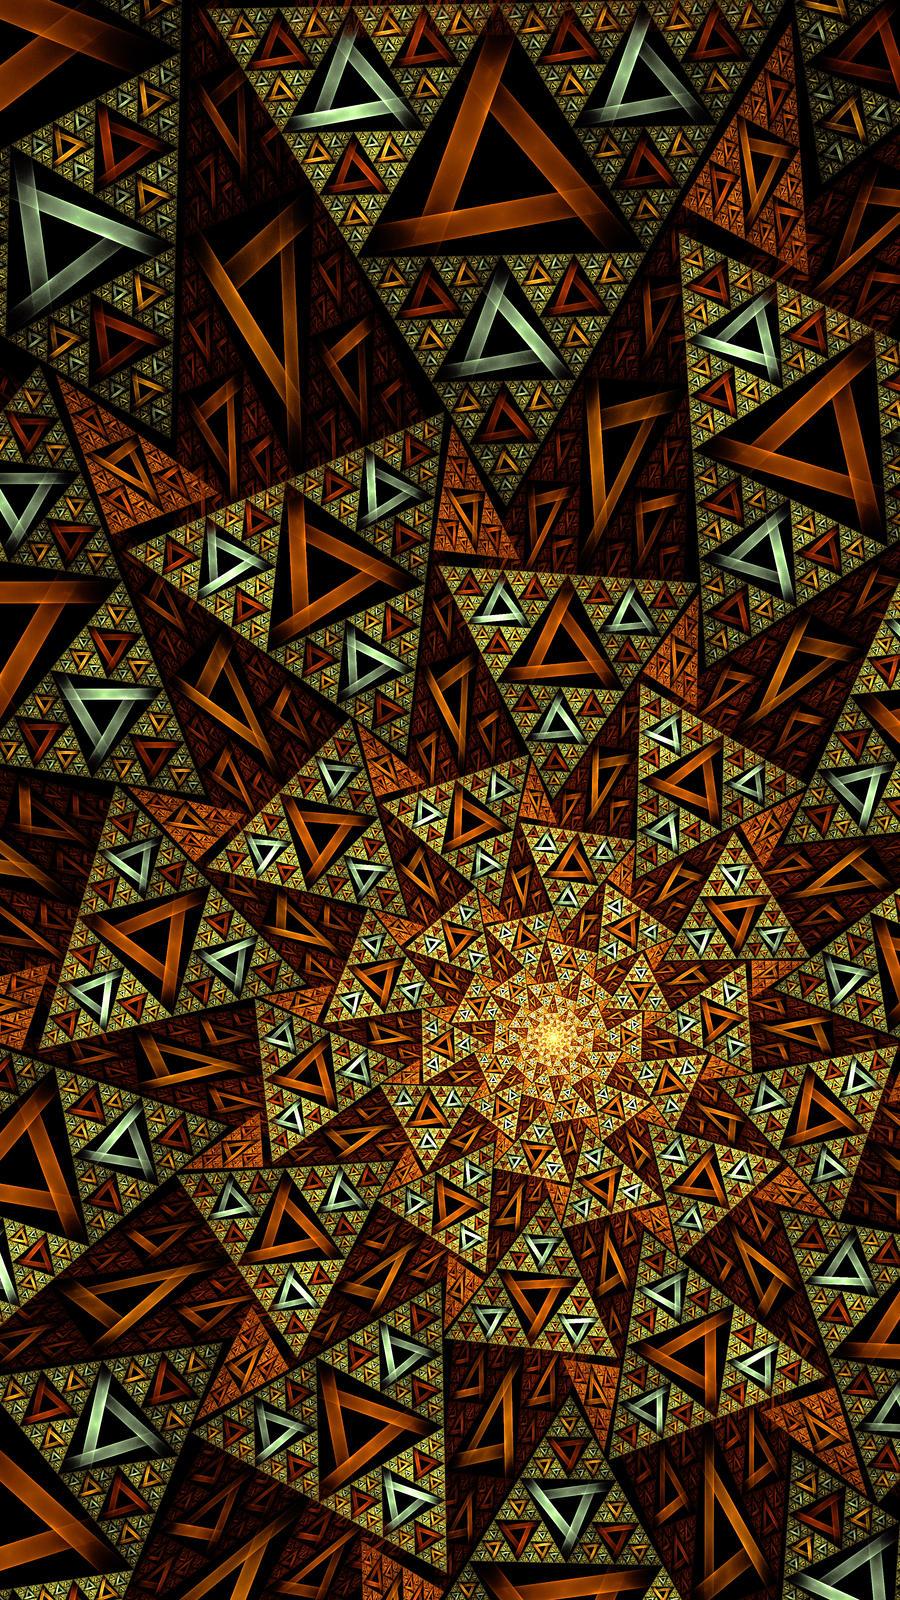 Xiuhtecuhtli's Calender Stone by JP-Talma